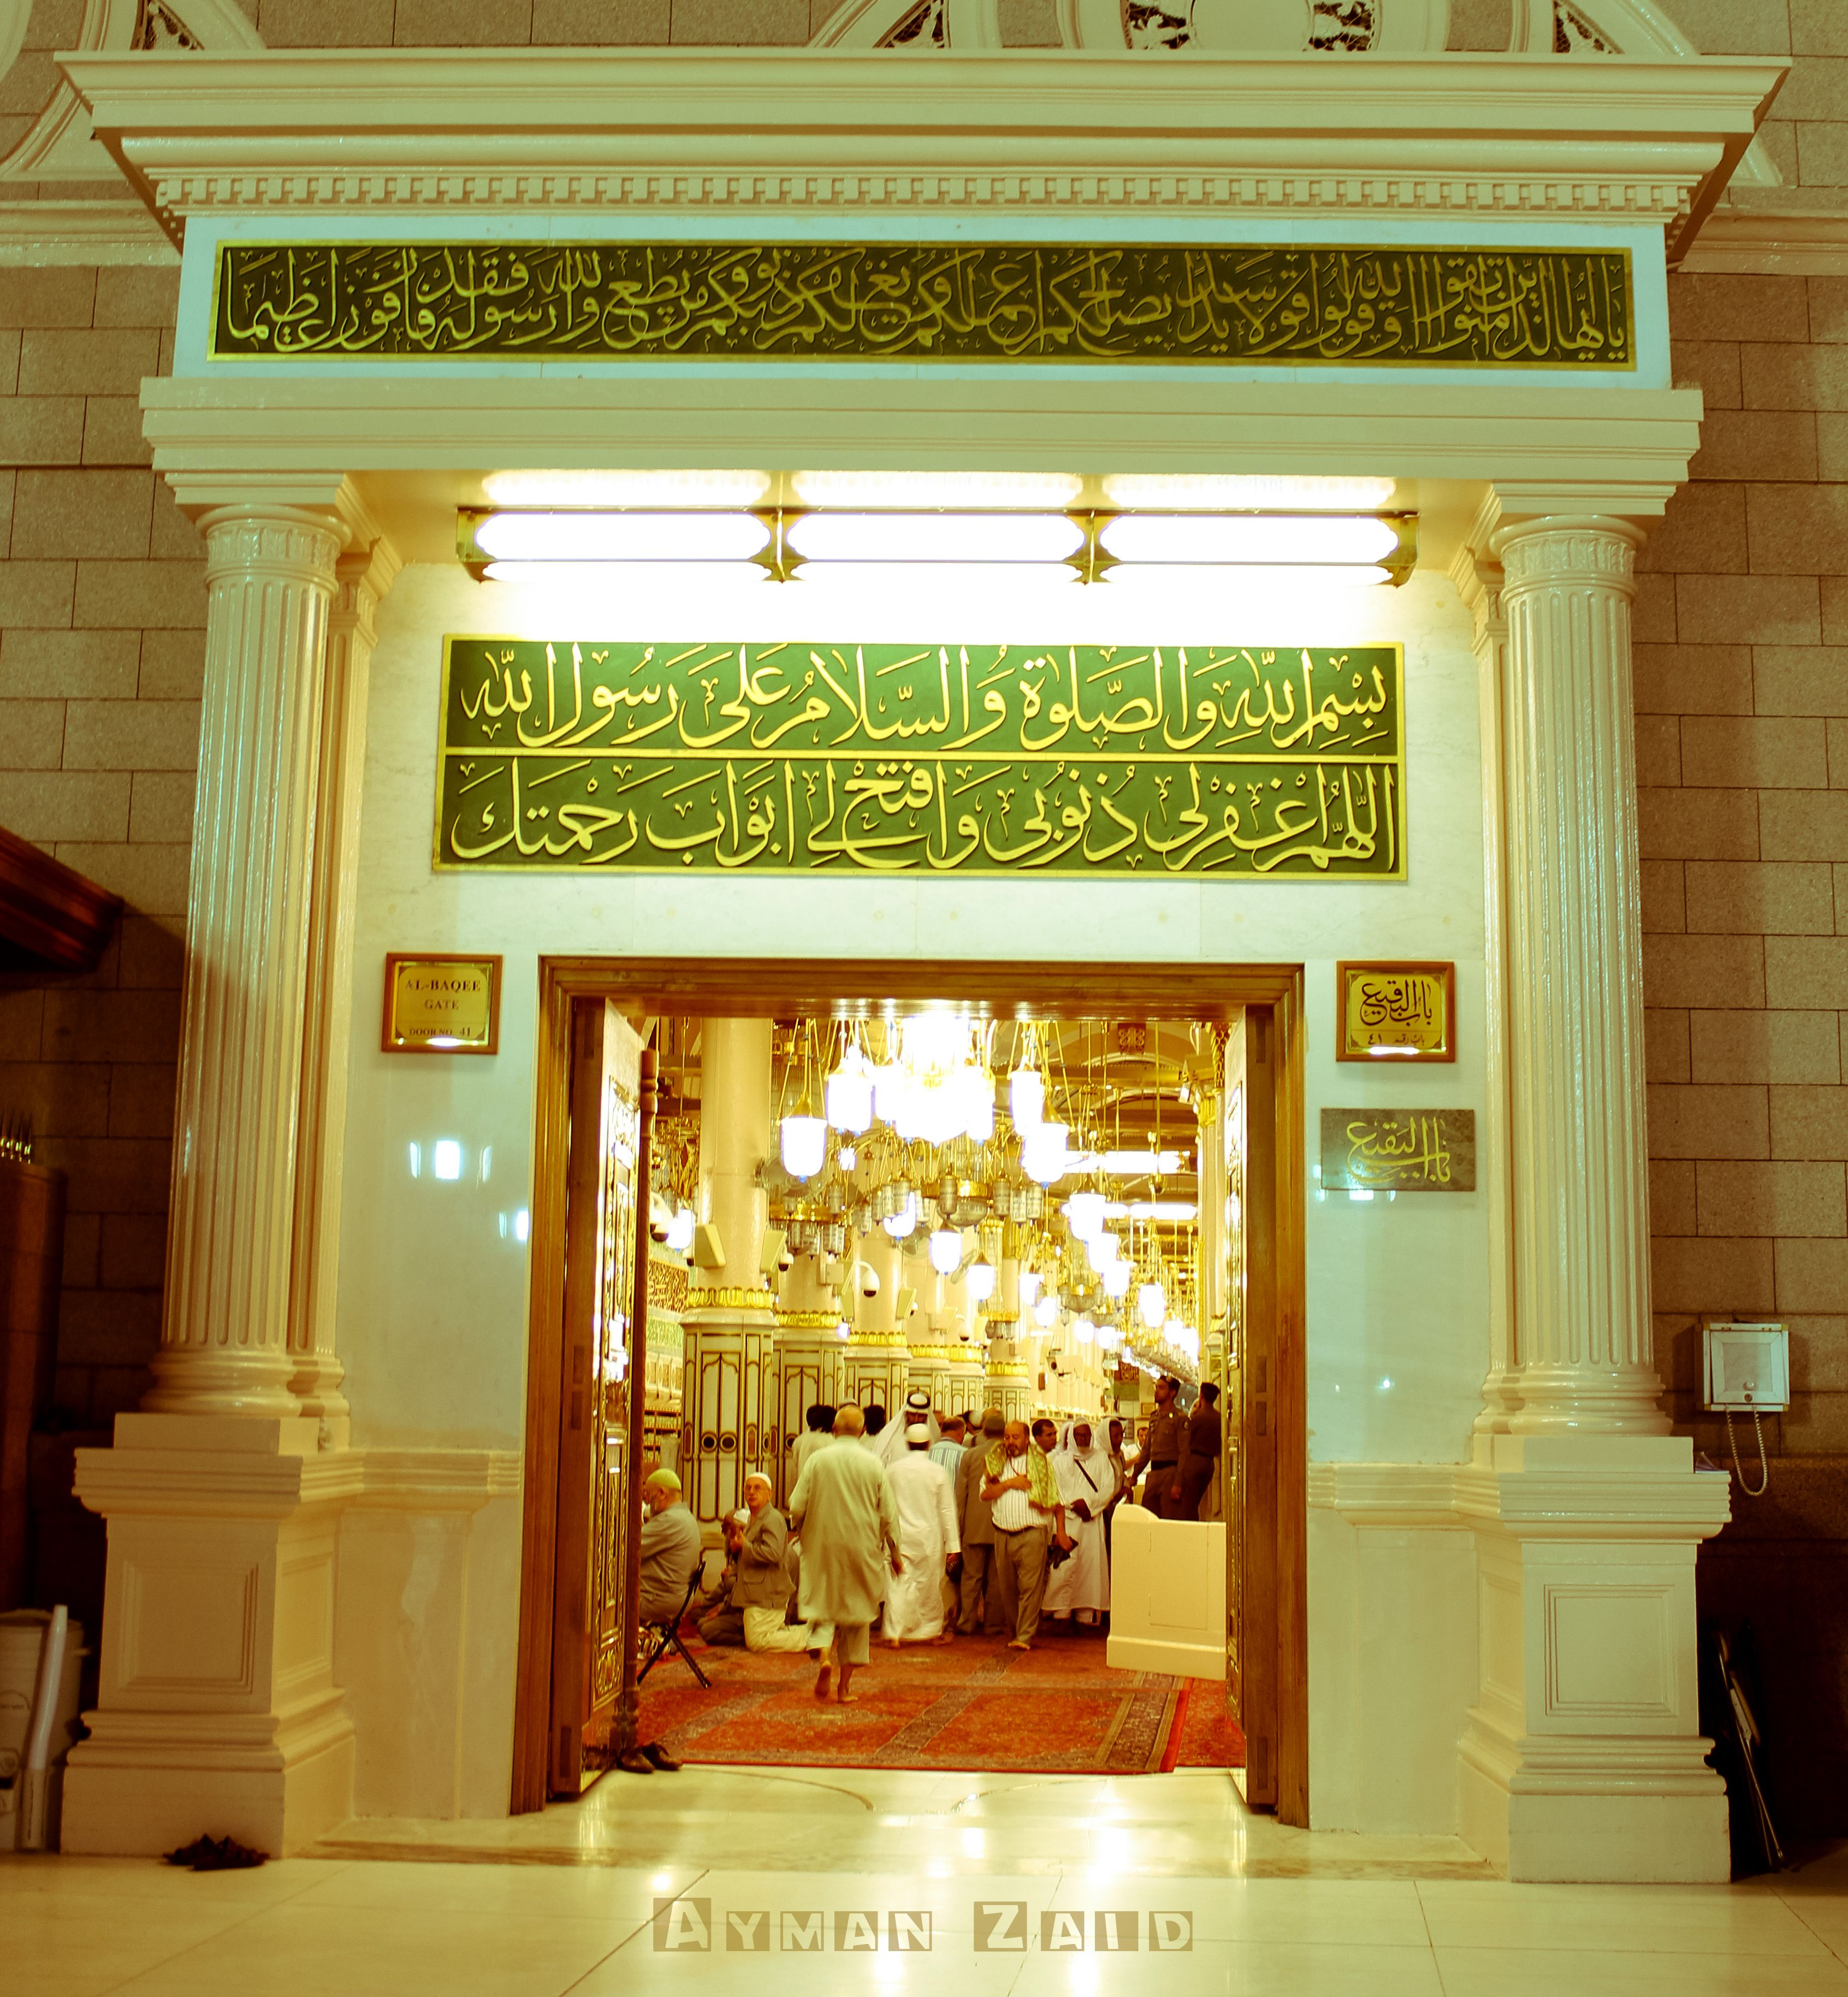 Madina المدينة المنورة المسجد النبوي الشريف باب البقيع Islamic Architecture Masjid Architecture